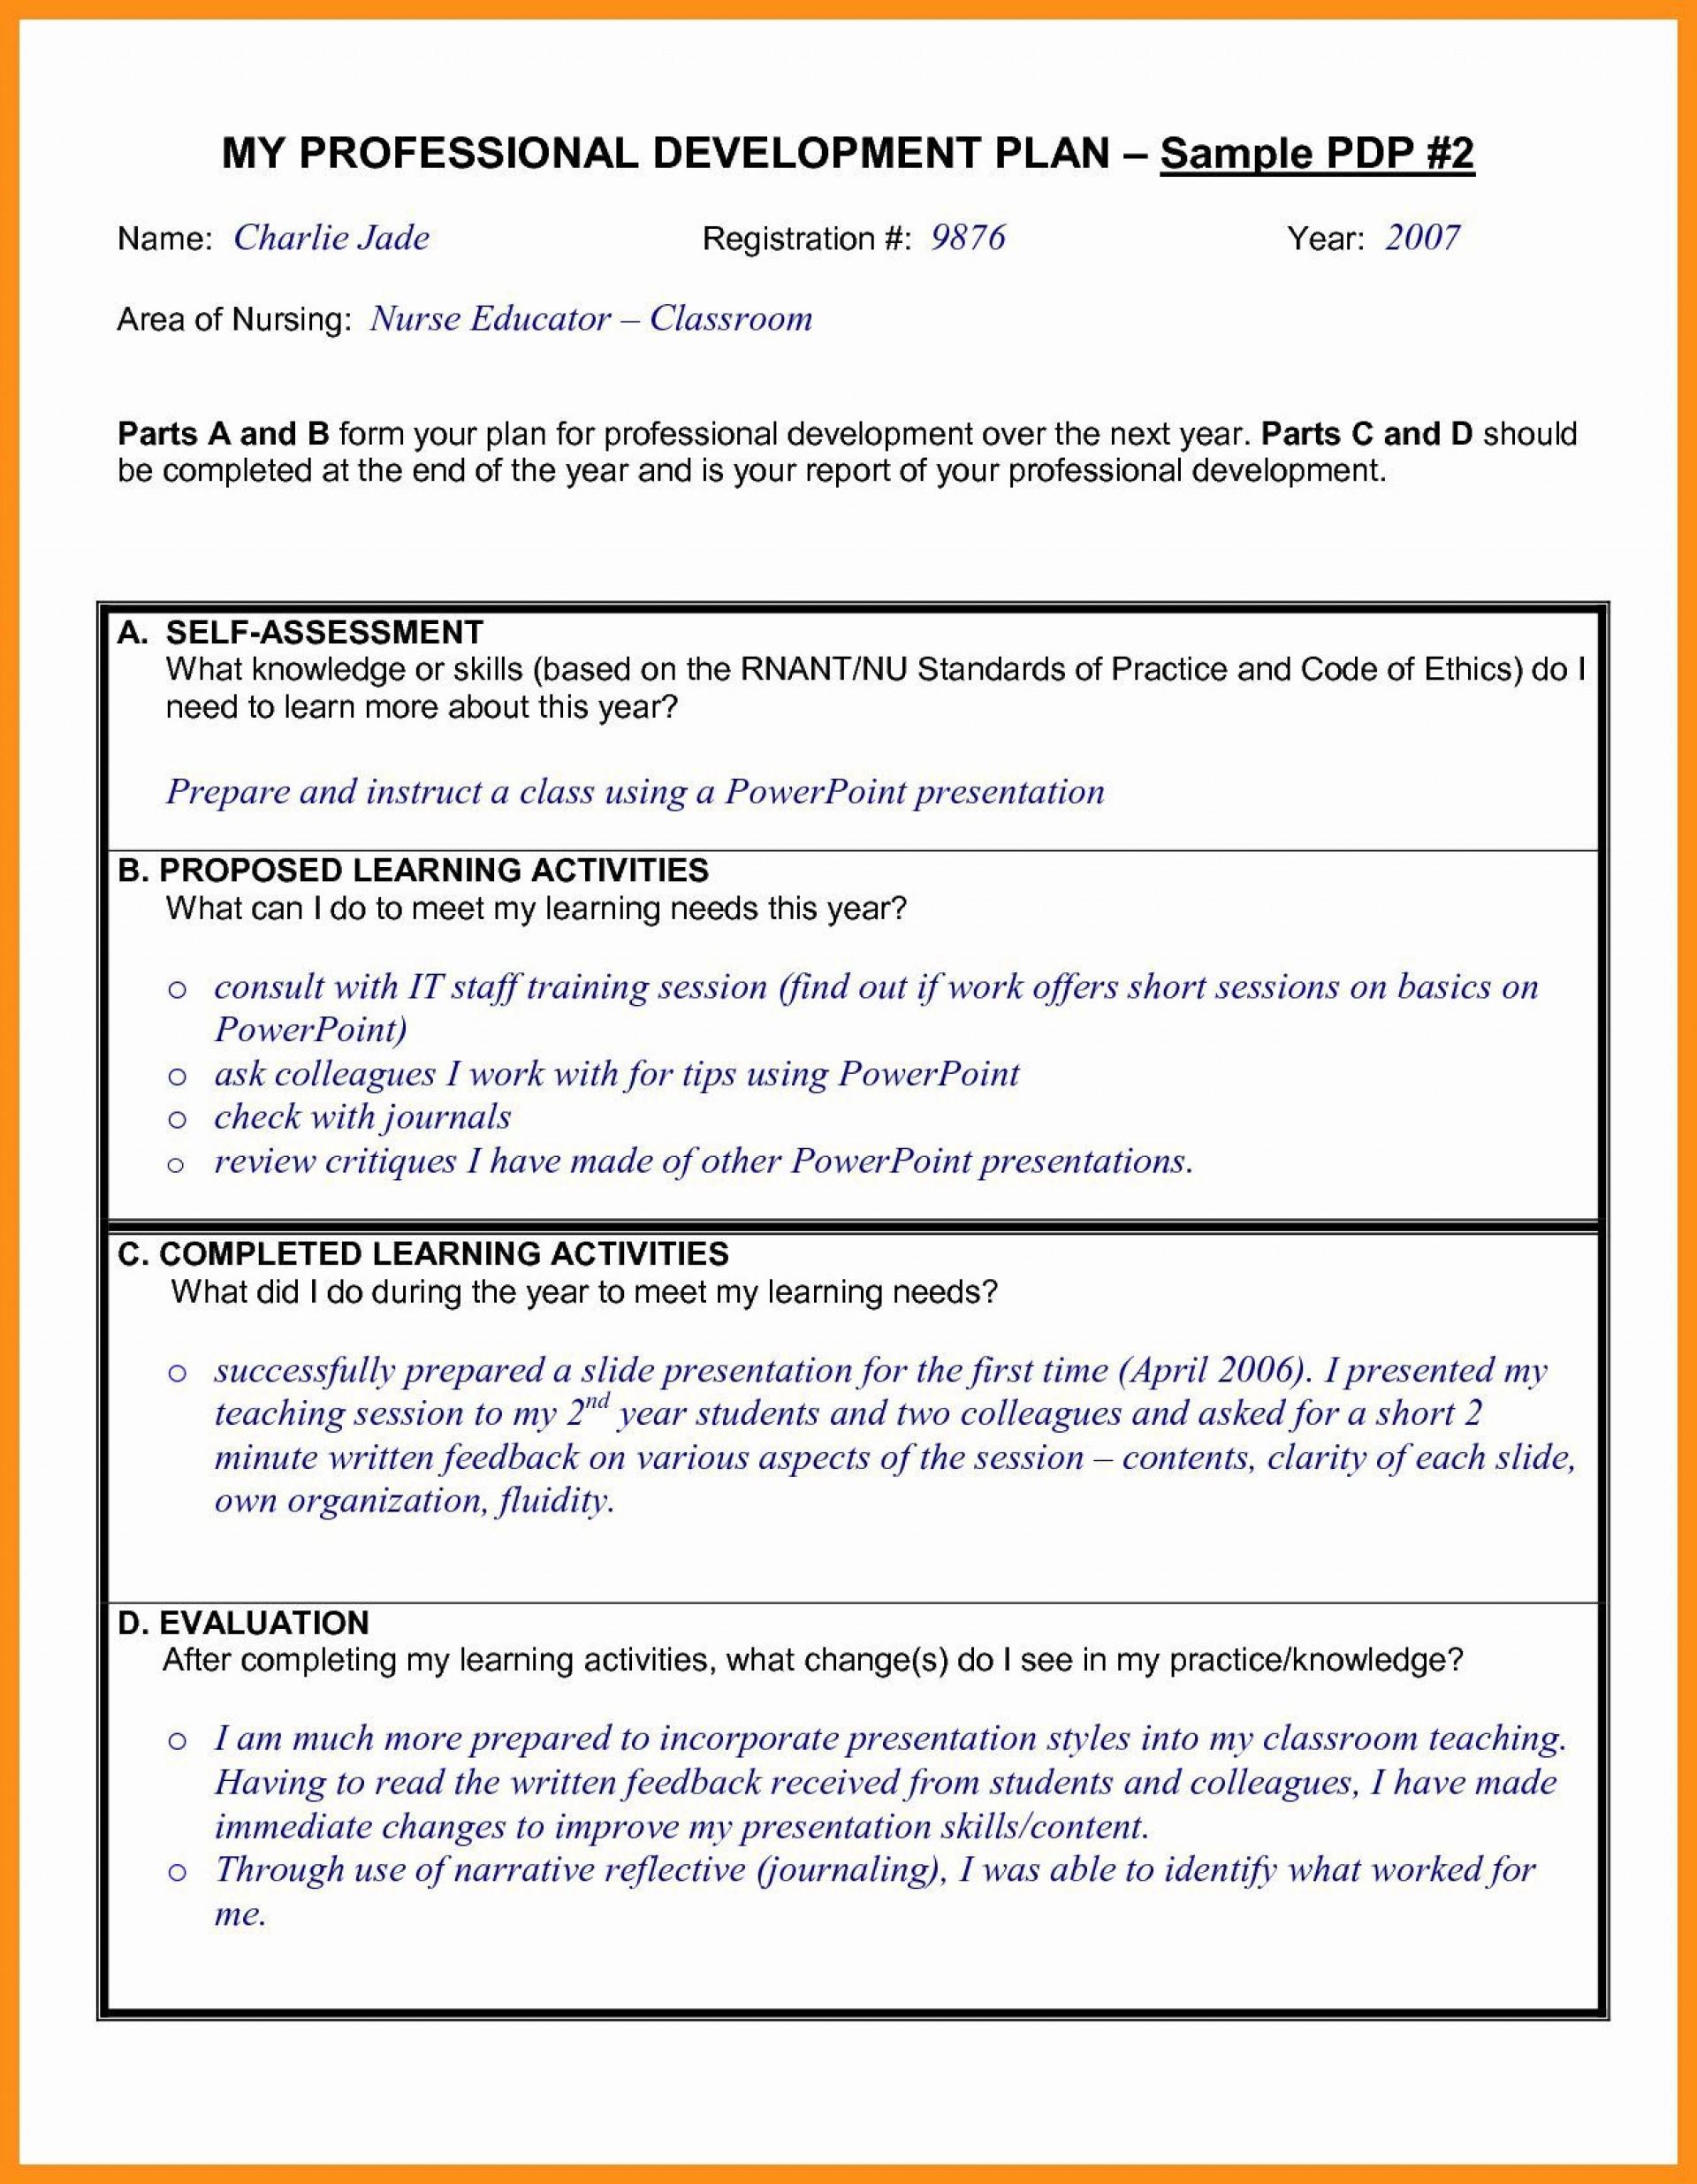 000 Exceptional Professional Development Plan For Teacher Template Doc High Resolution 1920